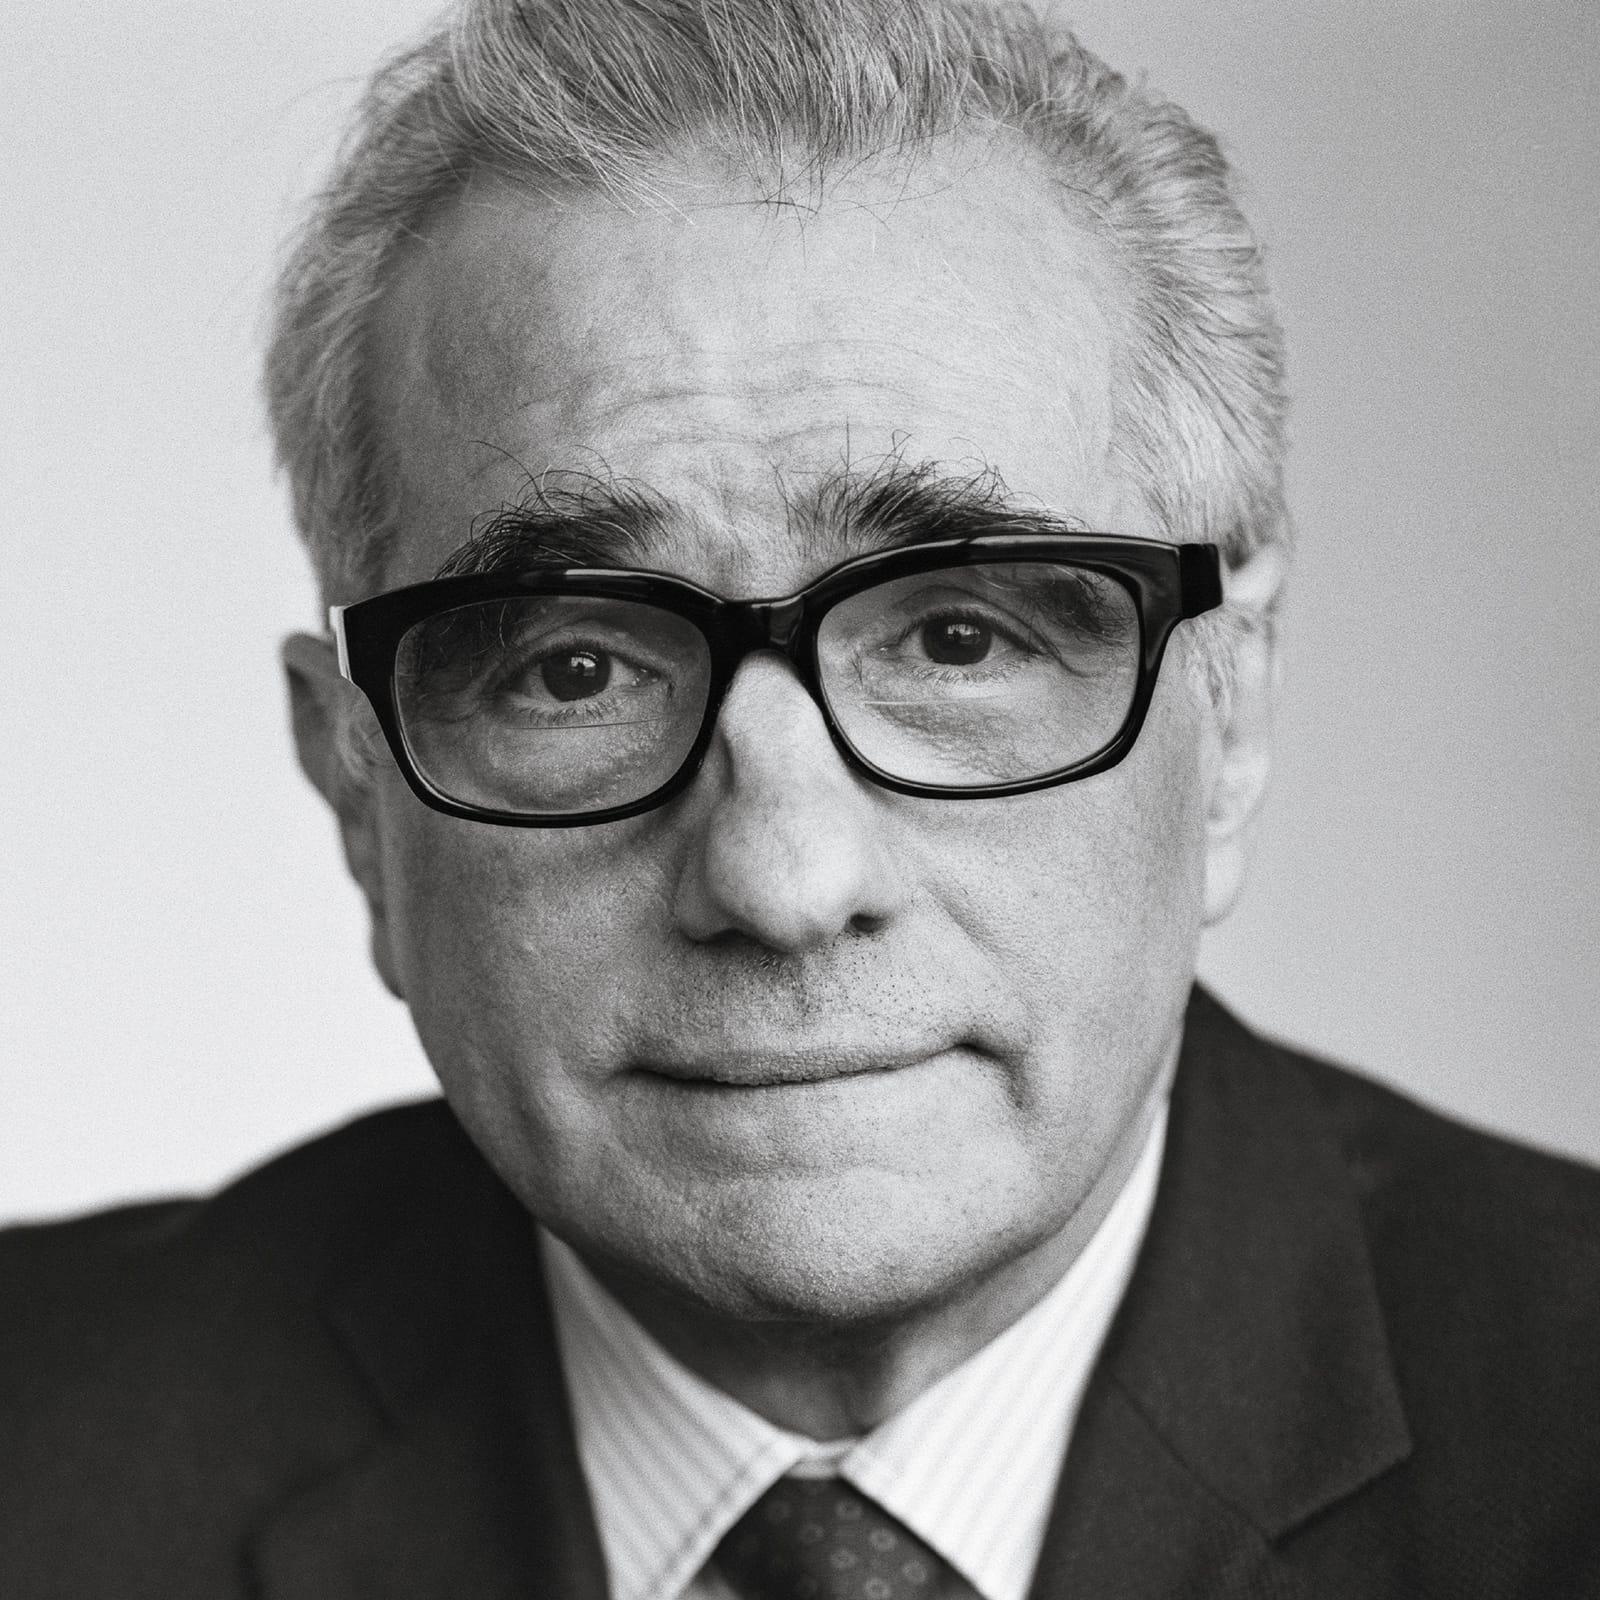 Alberto D Amico martin scorsese's top 10 | the current | the criterion